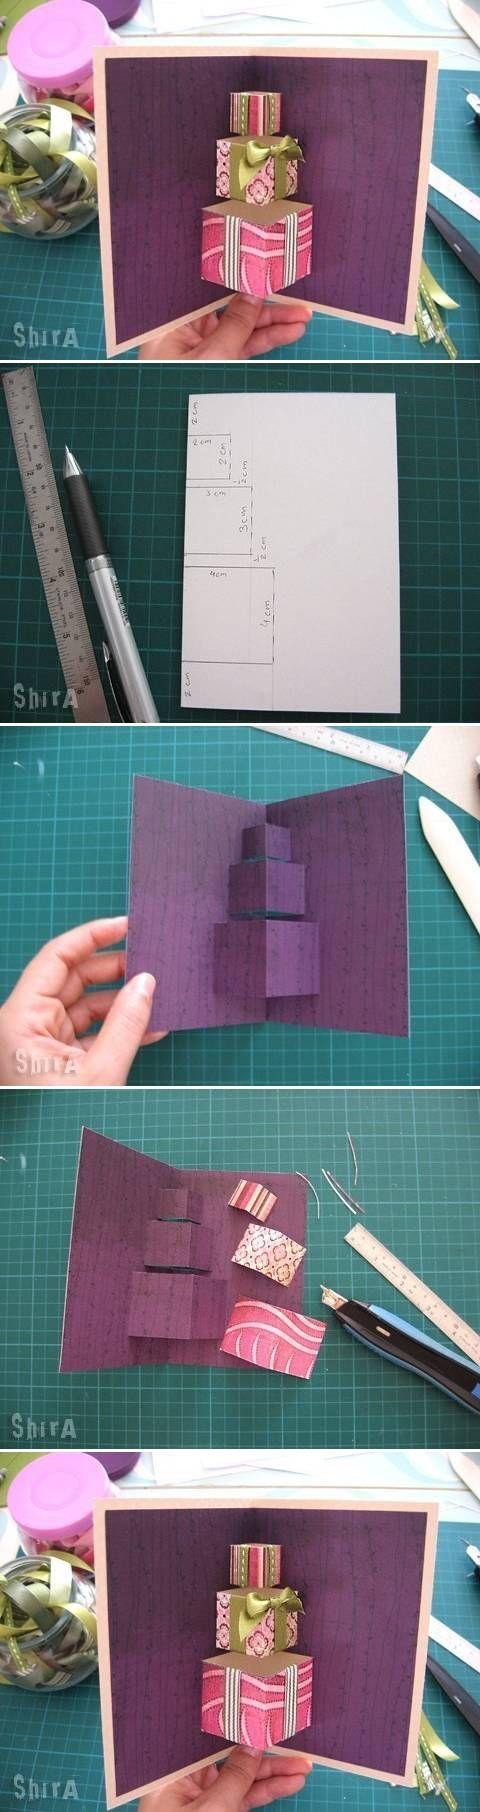 DIY Simple 3D Gift Card DIY Simple 3D Gift Card